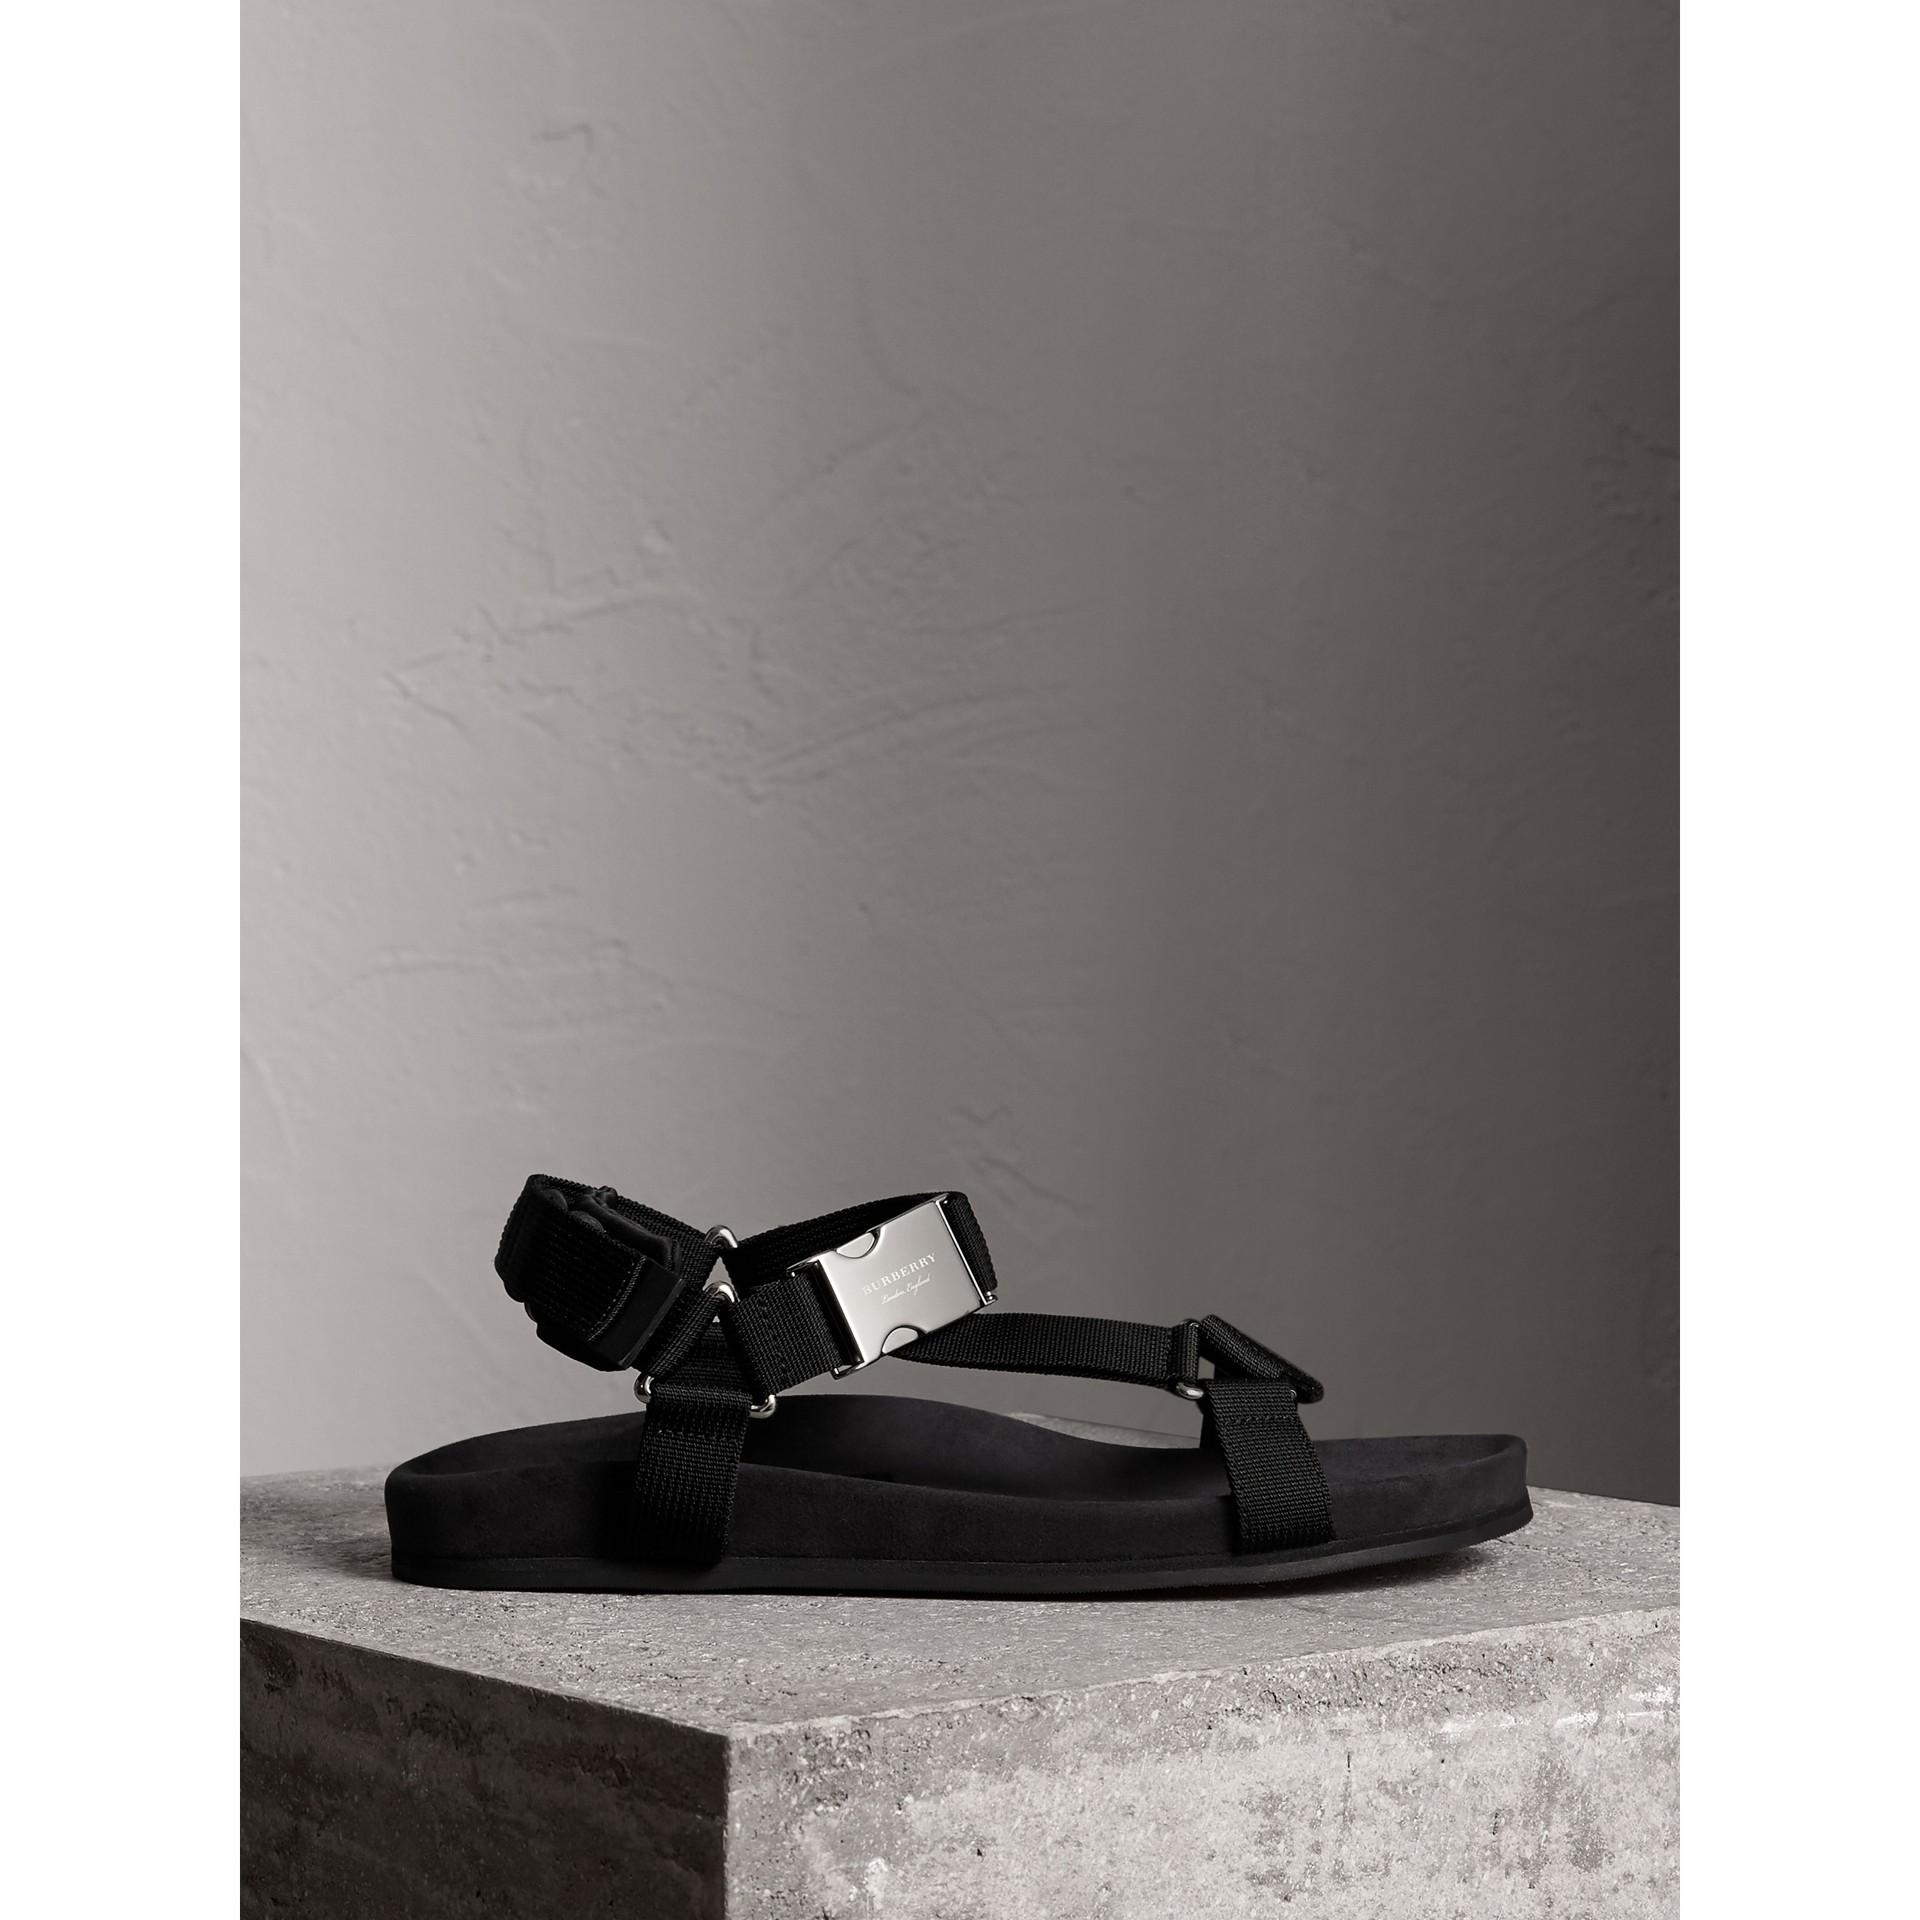 Three-point Strap Ripstop Sandals in Black - Men | Burberry Australia - gallery image 5